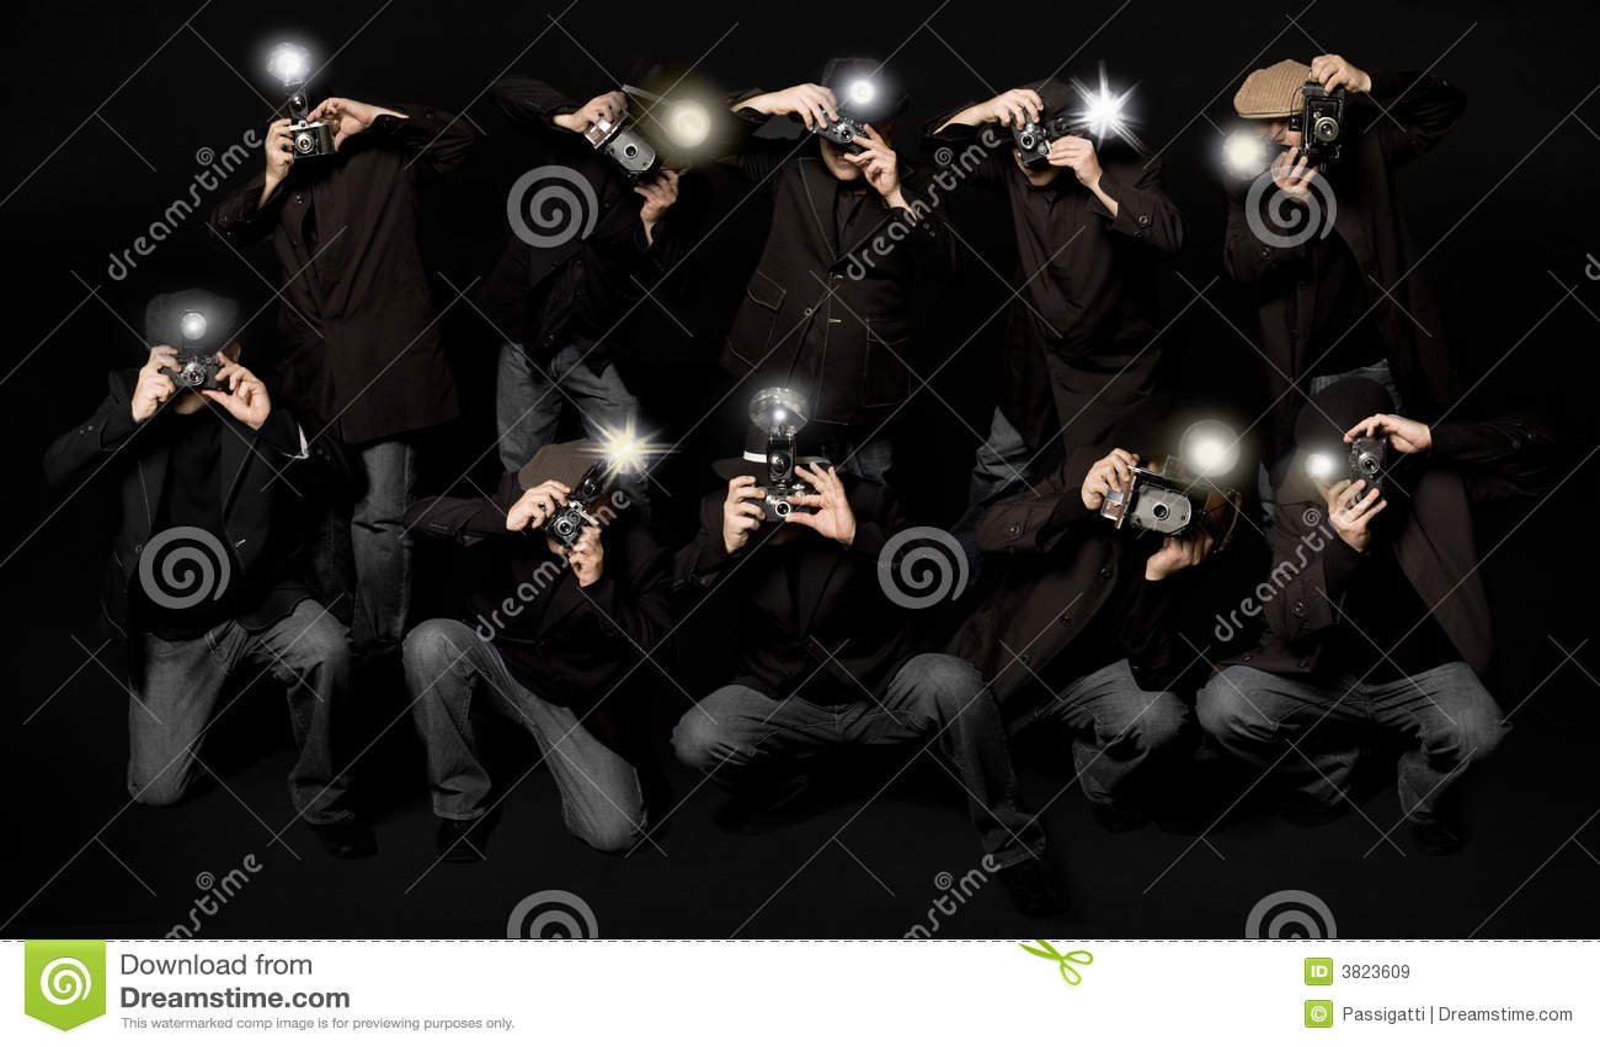 Retro stil för paparazziphotojournalists